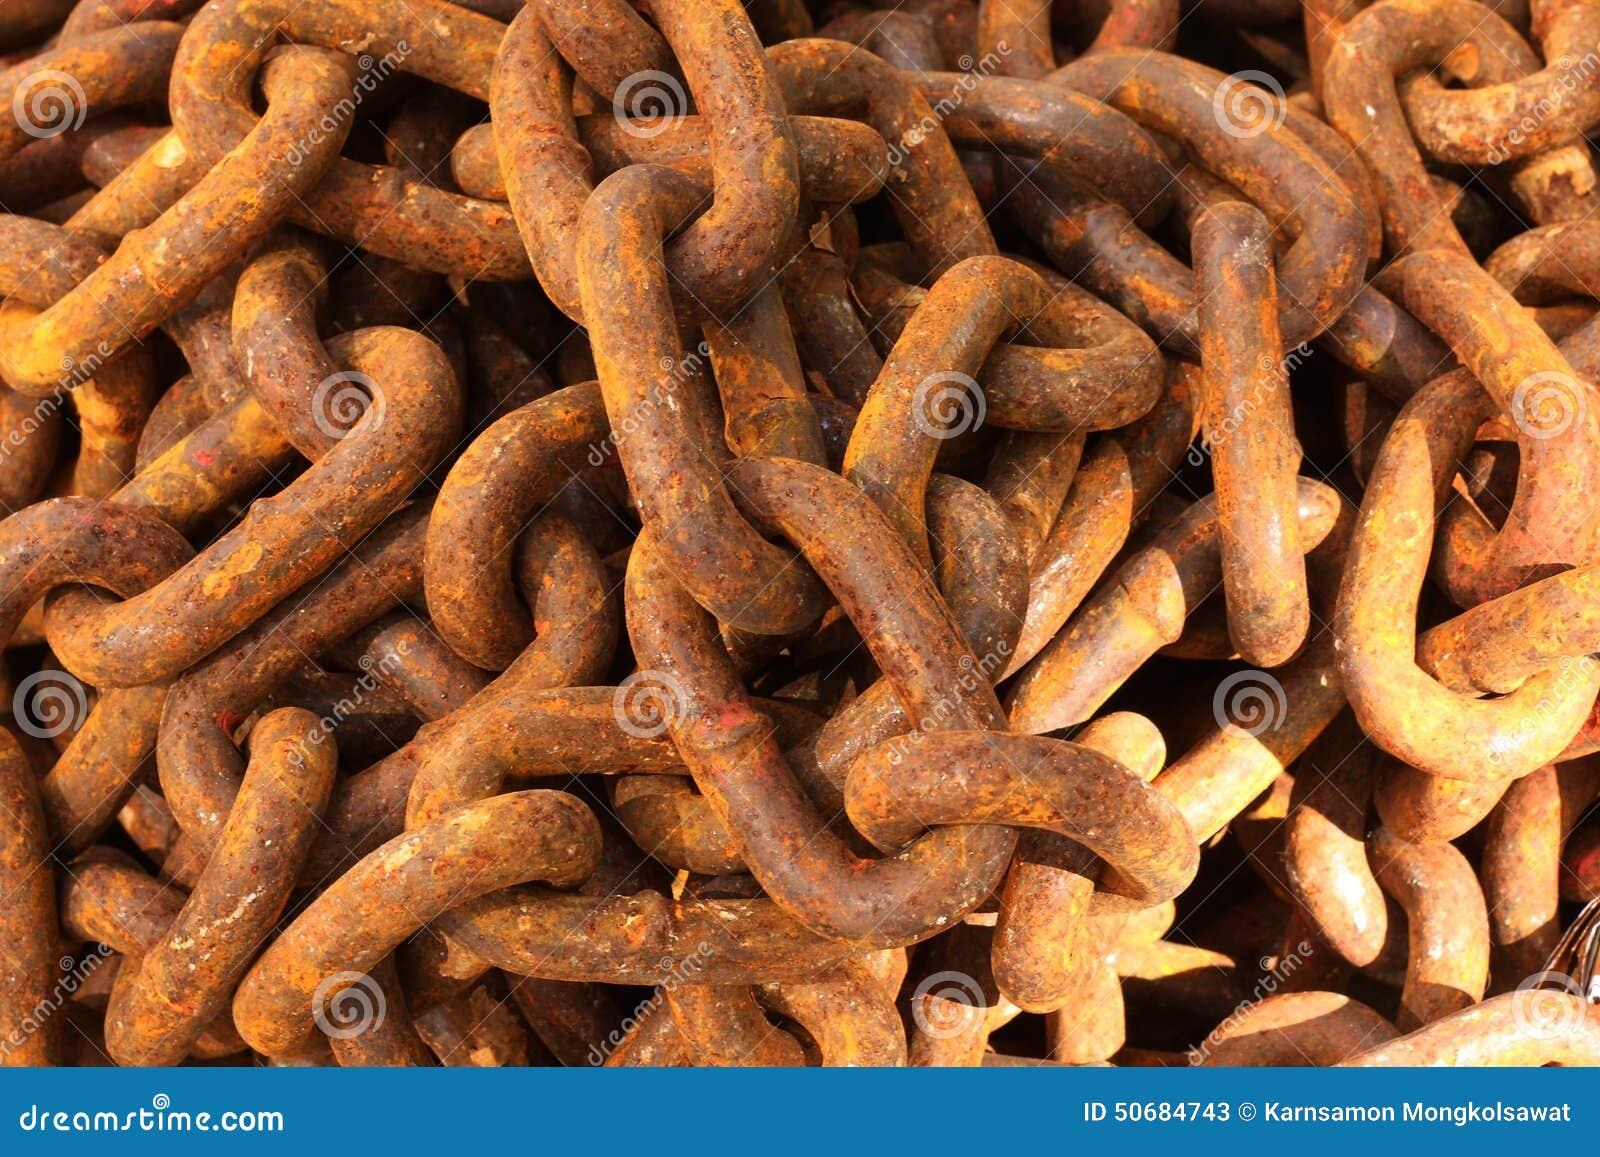 Download 关闭生锈的链堆 库存图片. 图片 包括有 详细资料, 铁锈, 年龄, 腊肠毒菌病, 连结, 提供保释金者 - 50684743